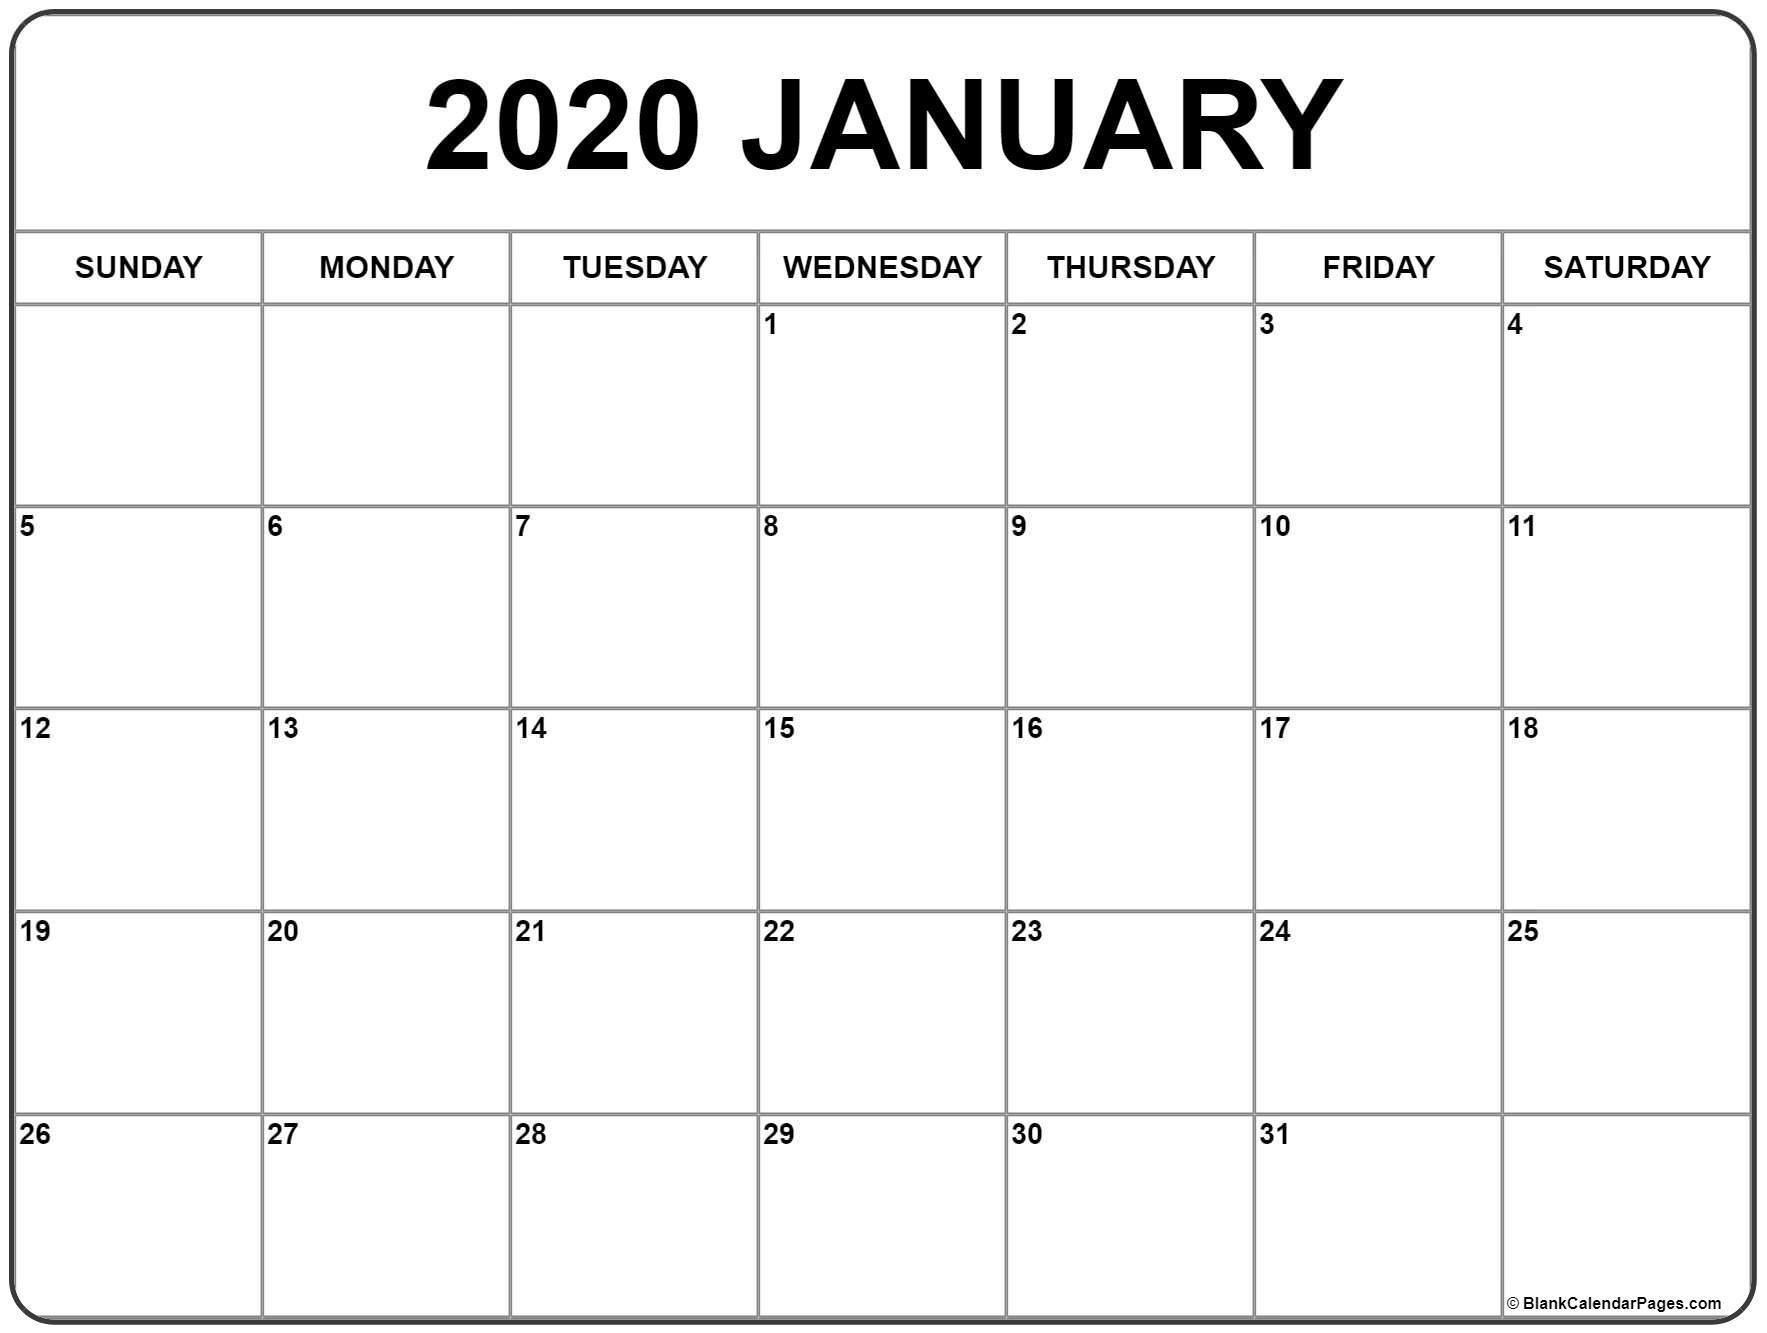 January 2020 Calendar | Free Printable Monthly Calendars regarding Jan 2020 Calendar